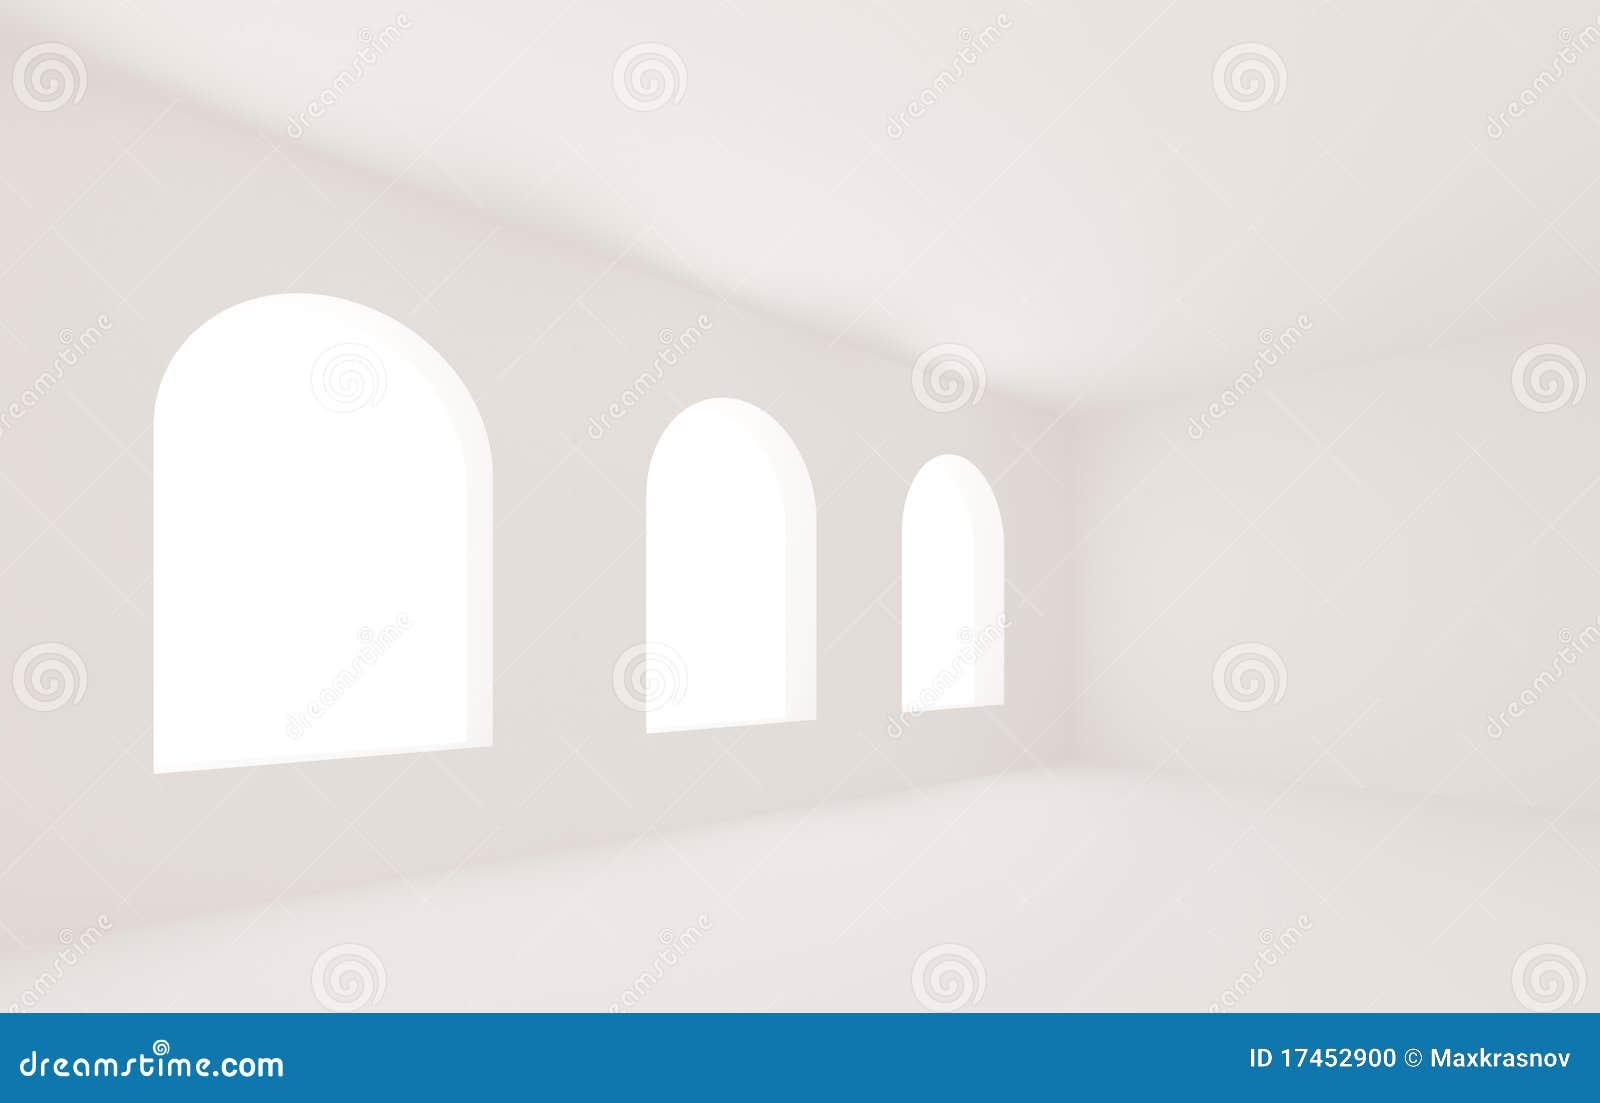 leerer wei er raum stockfoto bild 17452900. Black Bedroom Furniture Sets. Home Design Ideas